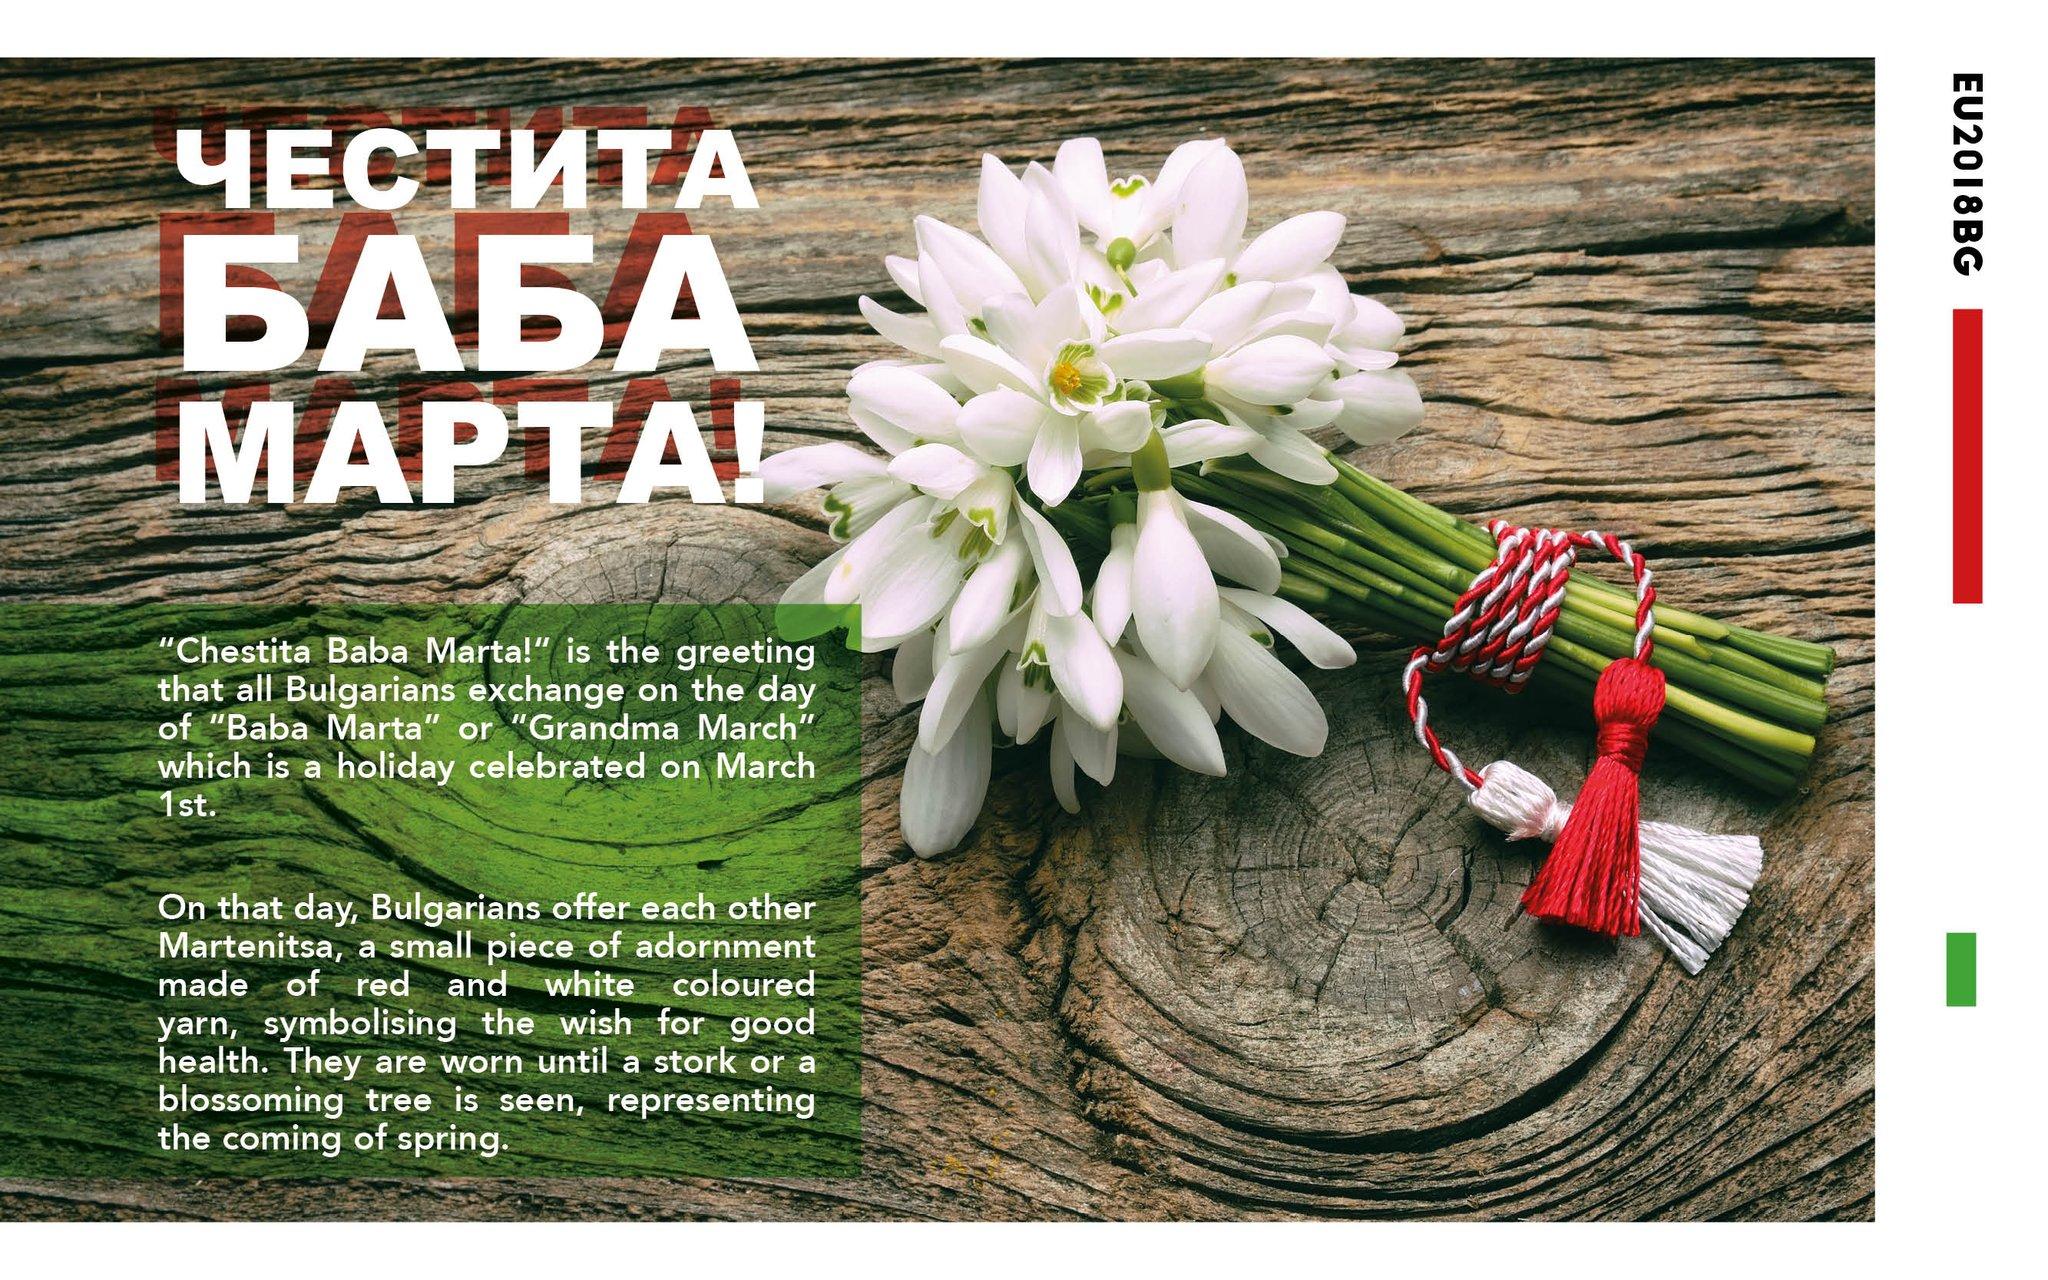 Ekaterina Zaharieva On Twitter Chestita Babamarta